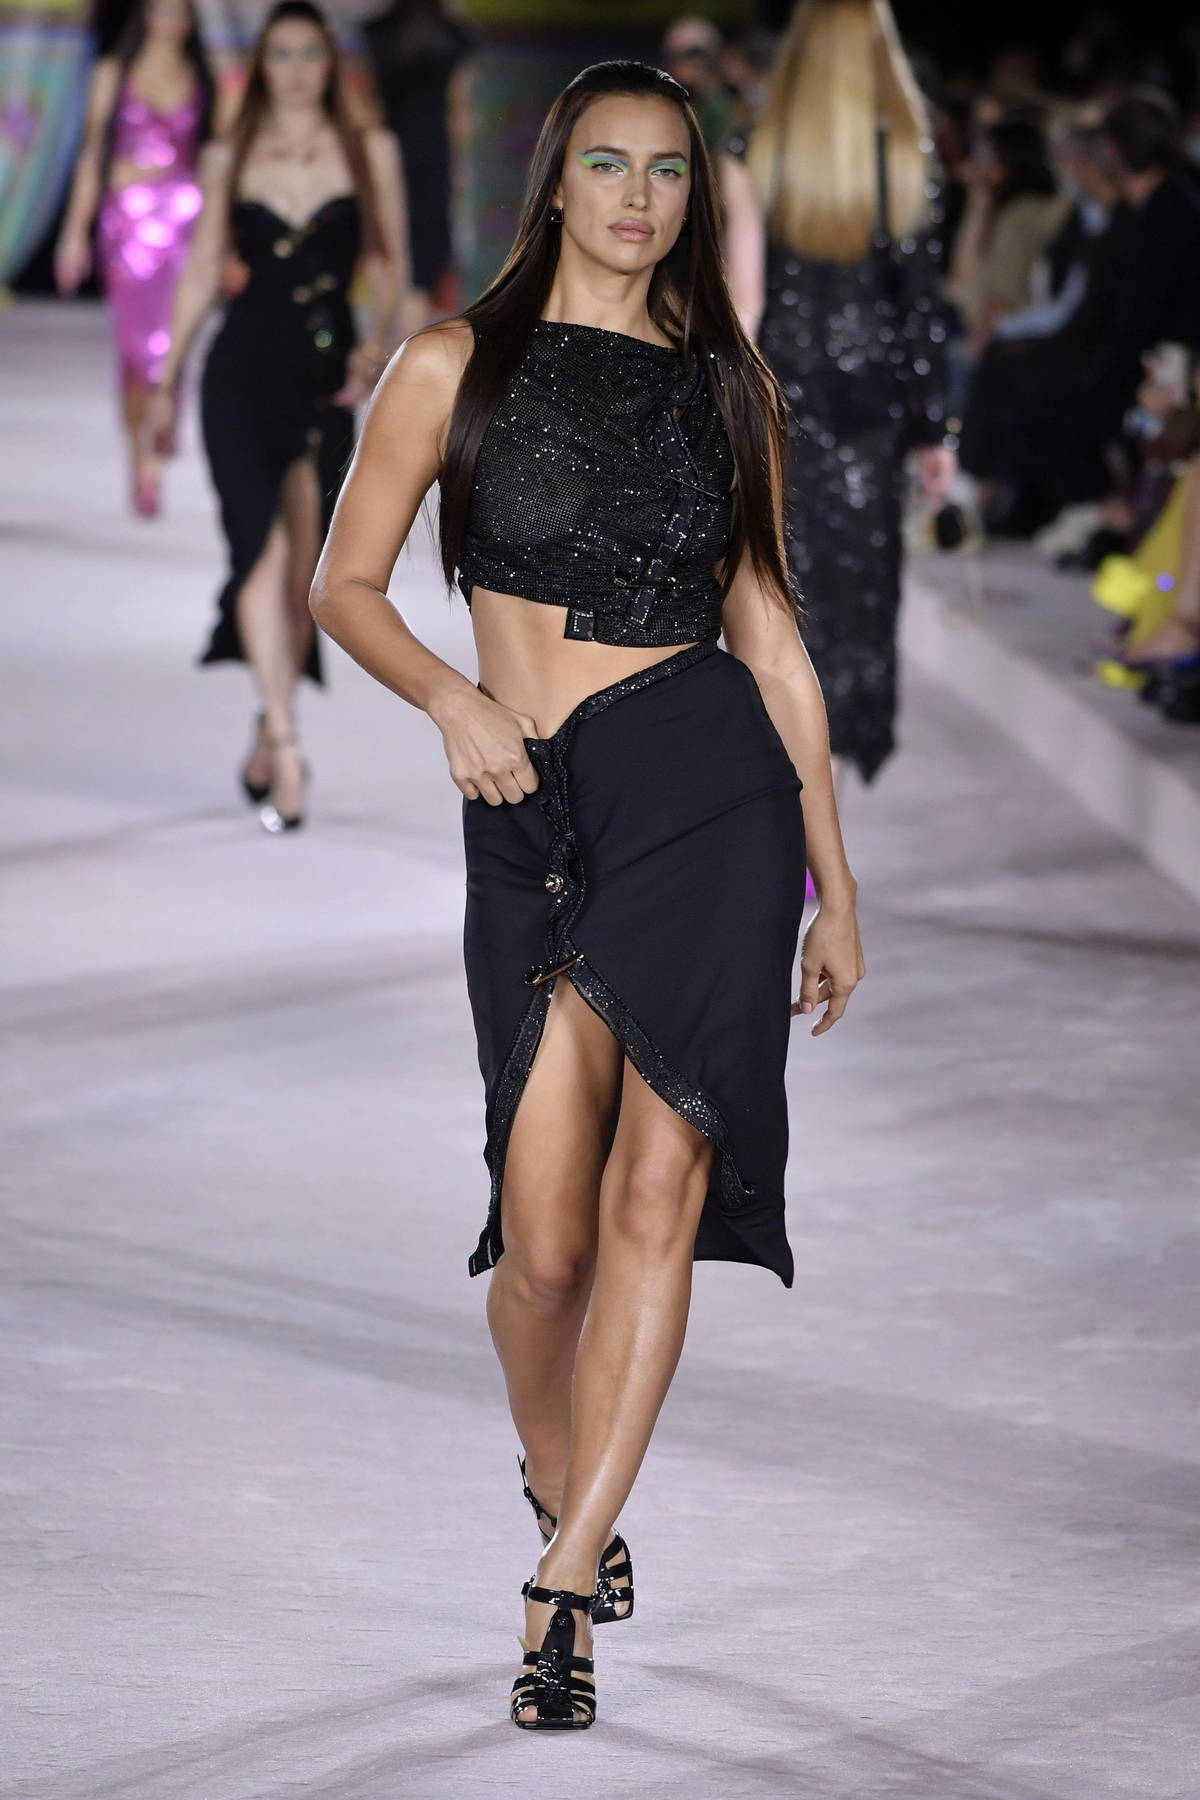 Irina Shayk walks the runway for The Versace SS22 fashion show during Milan Fashion Week in Milan, Italy